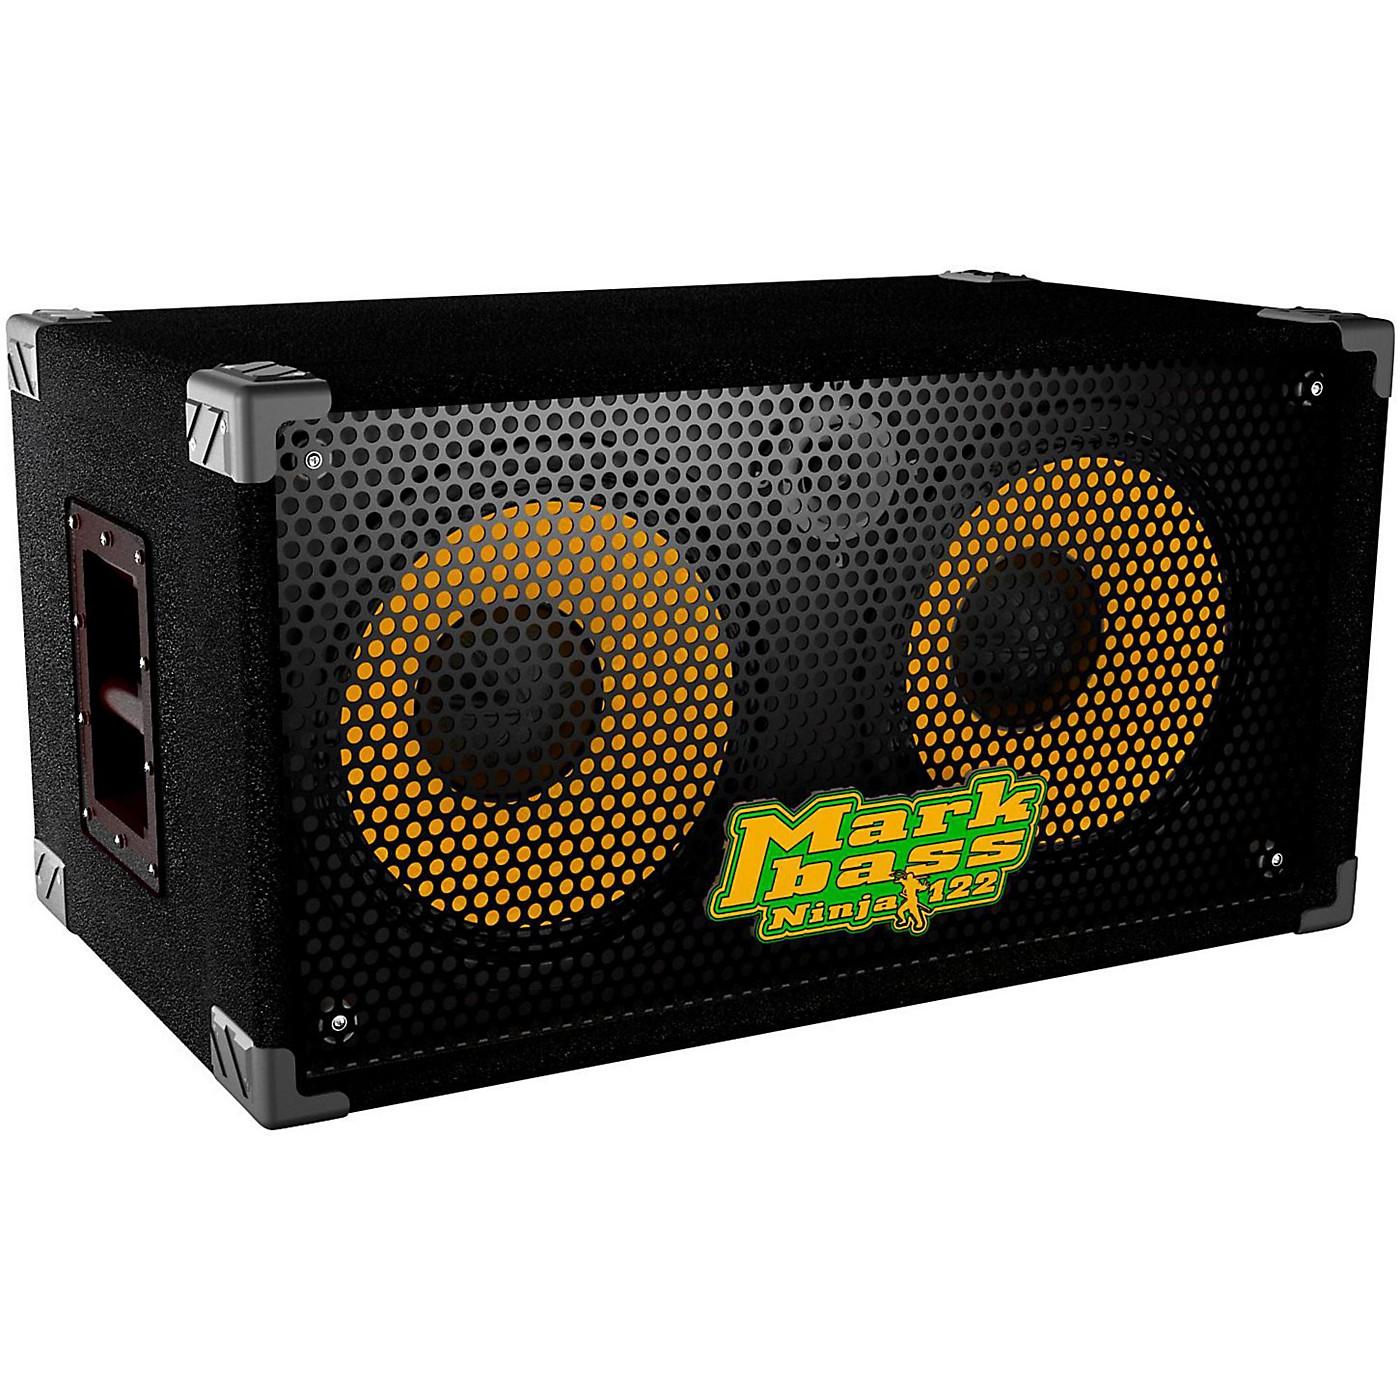 Markbass New York 122 Ninja 2x12 Richard Bona Signature Bass Speaker Cabinet thumbnail